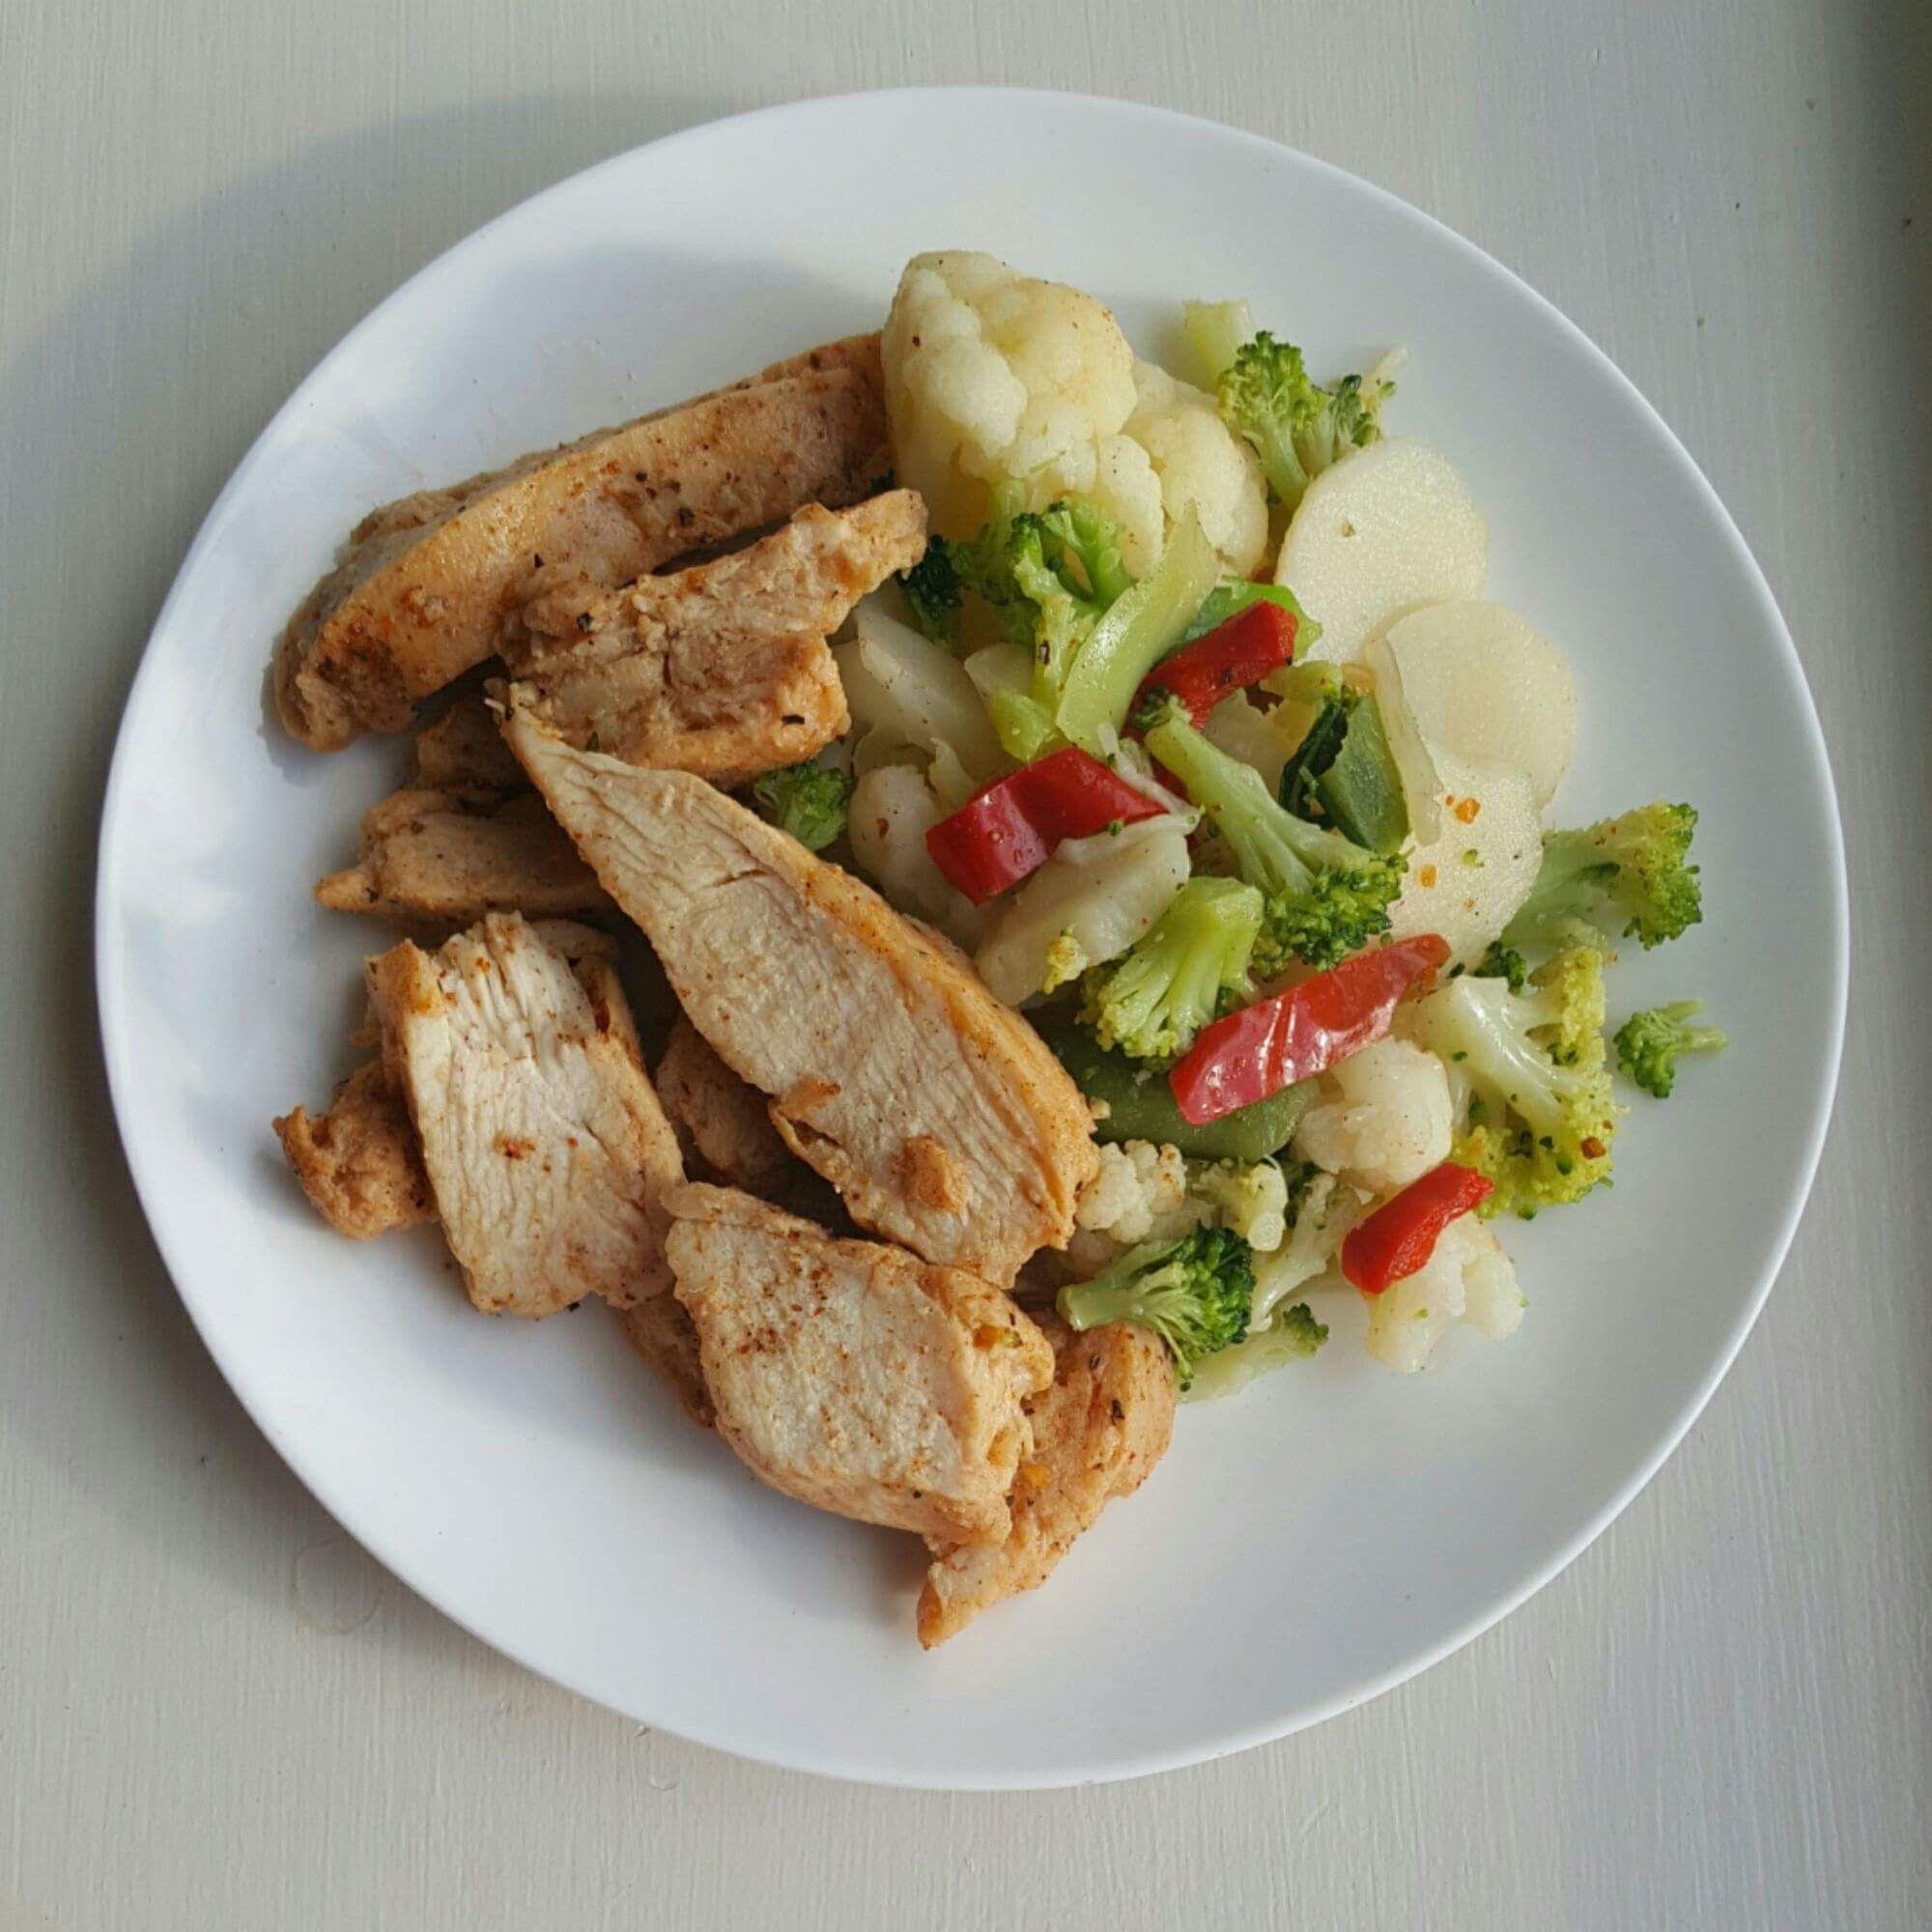 Paleo options easy dinner recipes healthy recipes meals